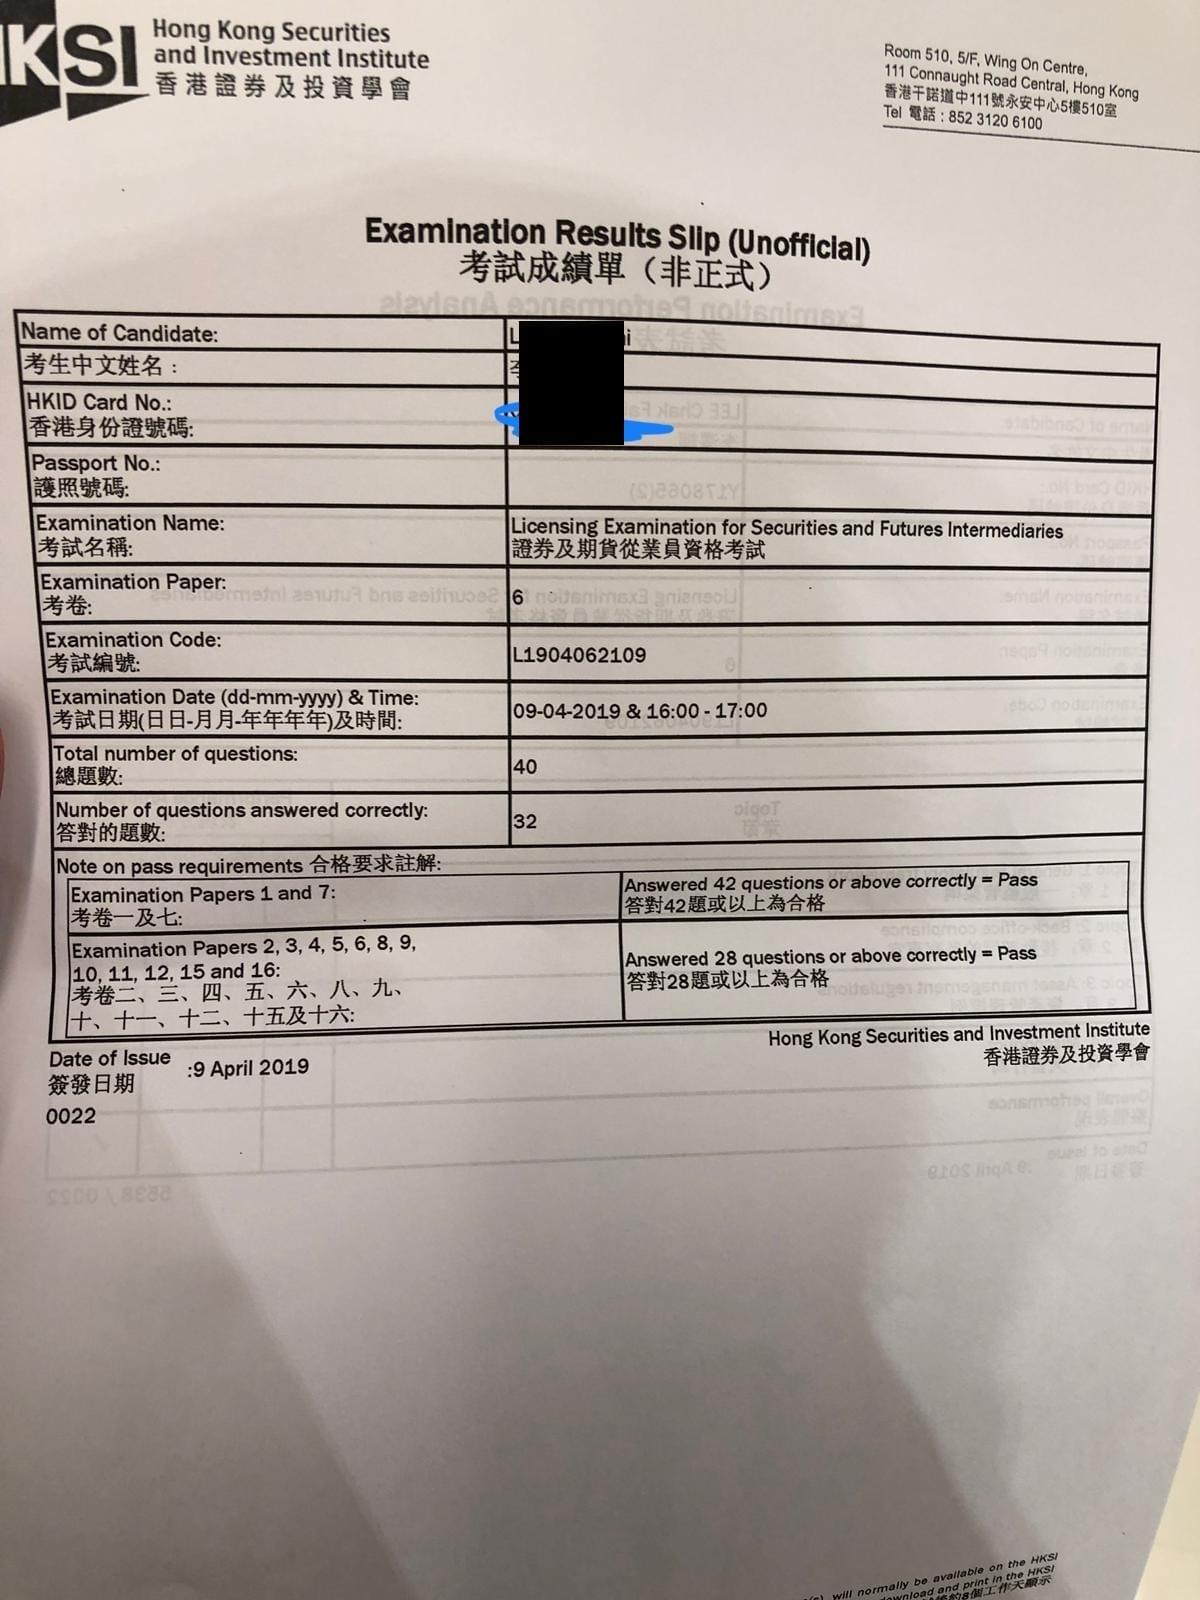 CSL 9/4/2019 LE Paper 6 證券期貨從業員資格考試卷六 Pass